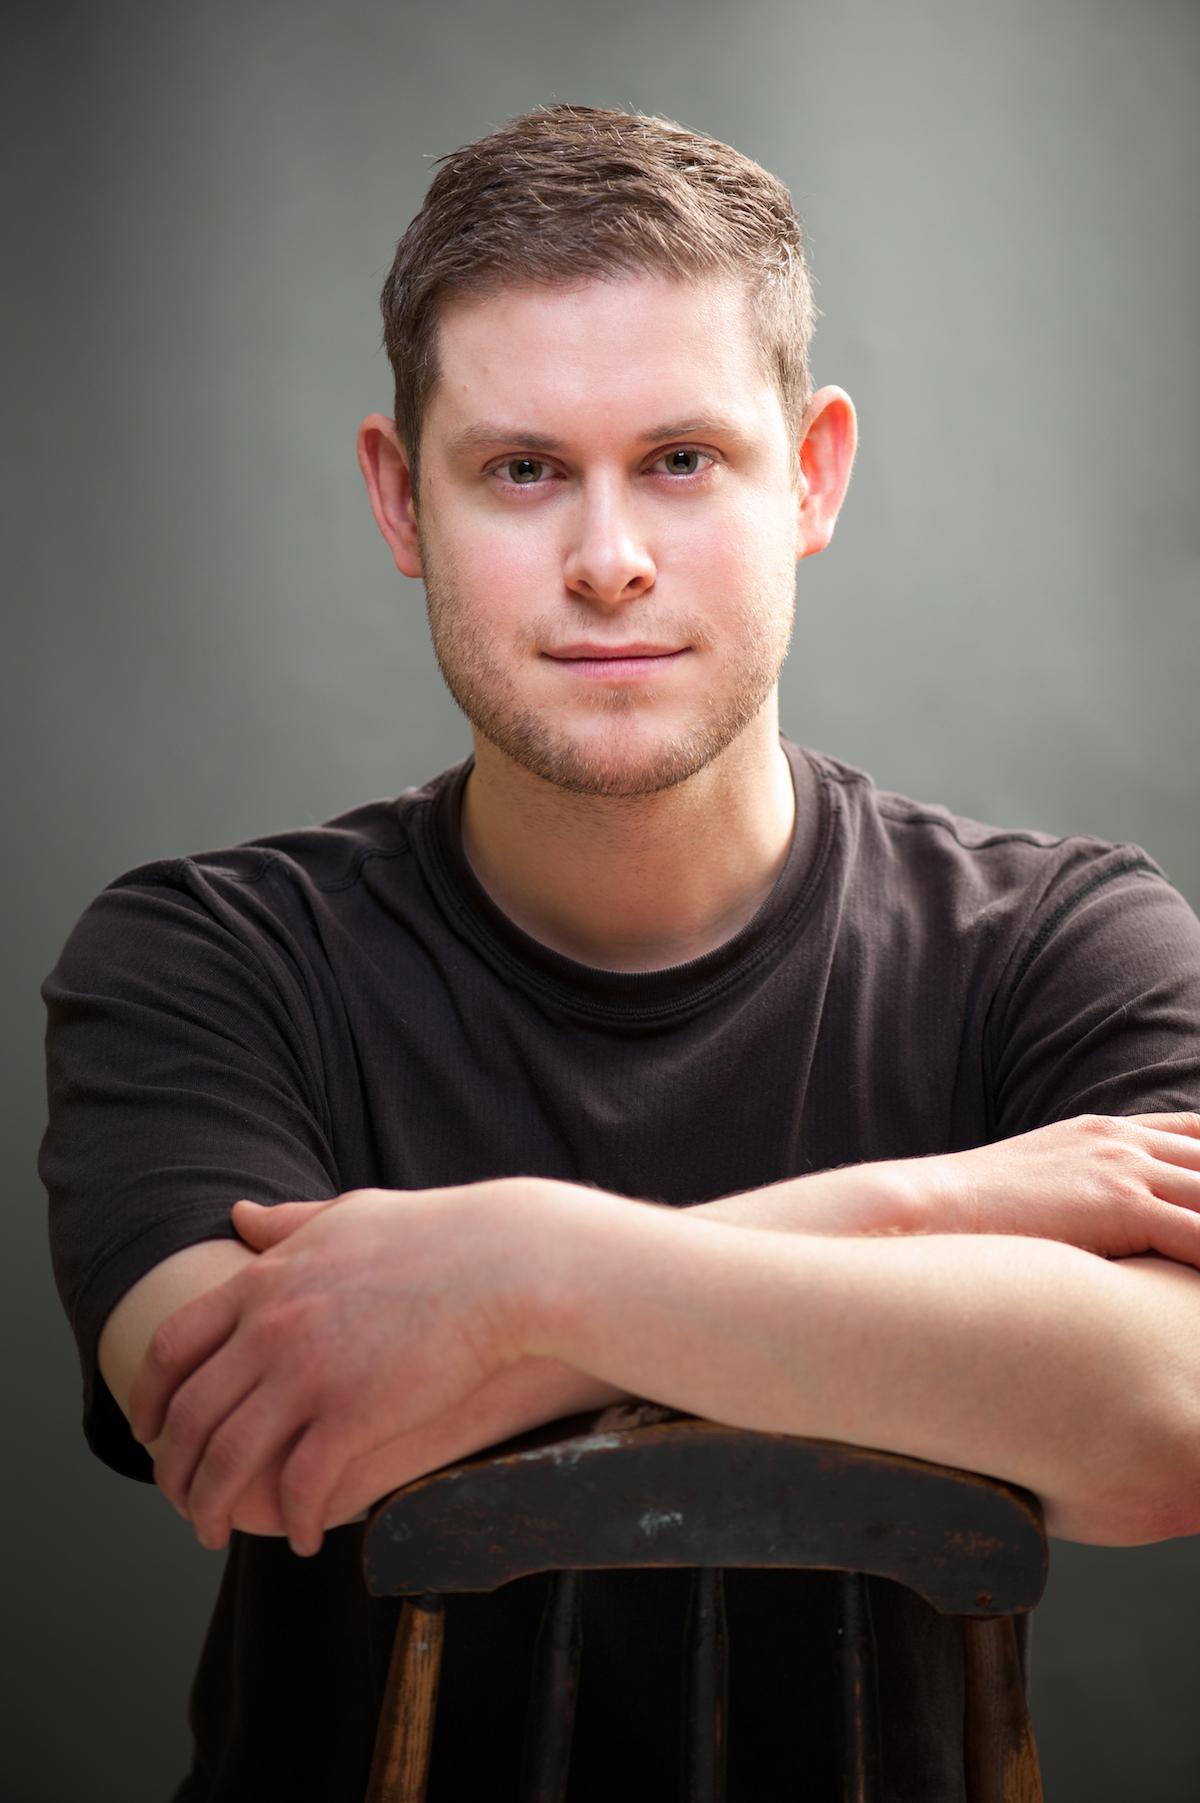 Ethan Atkinson